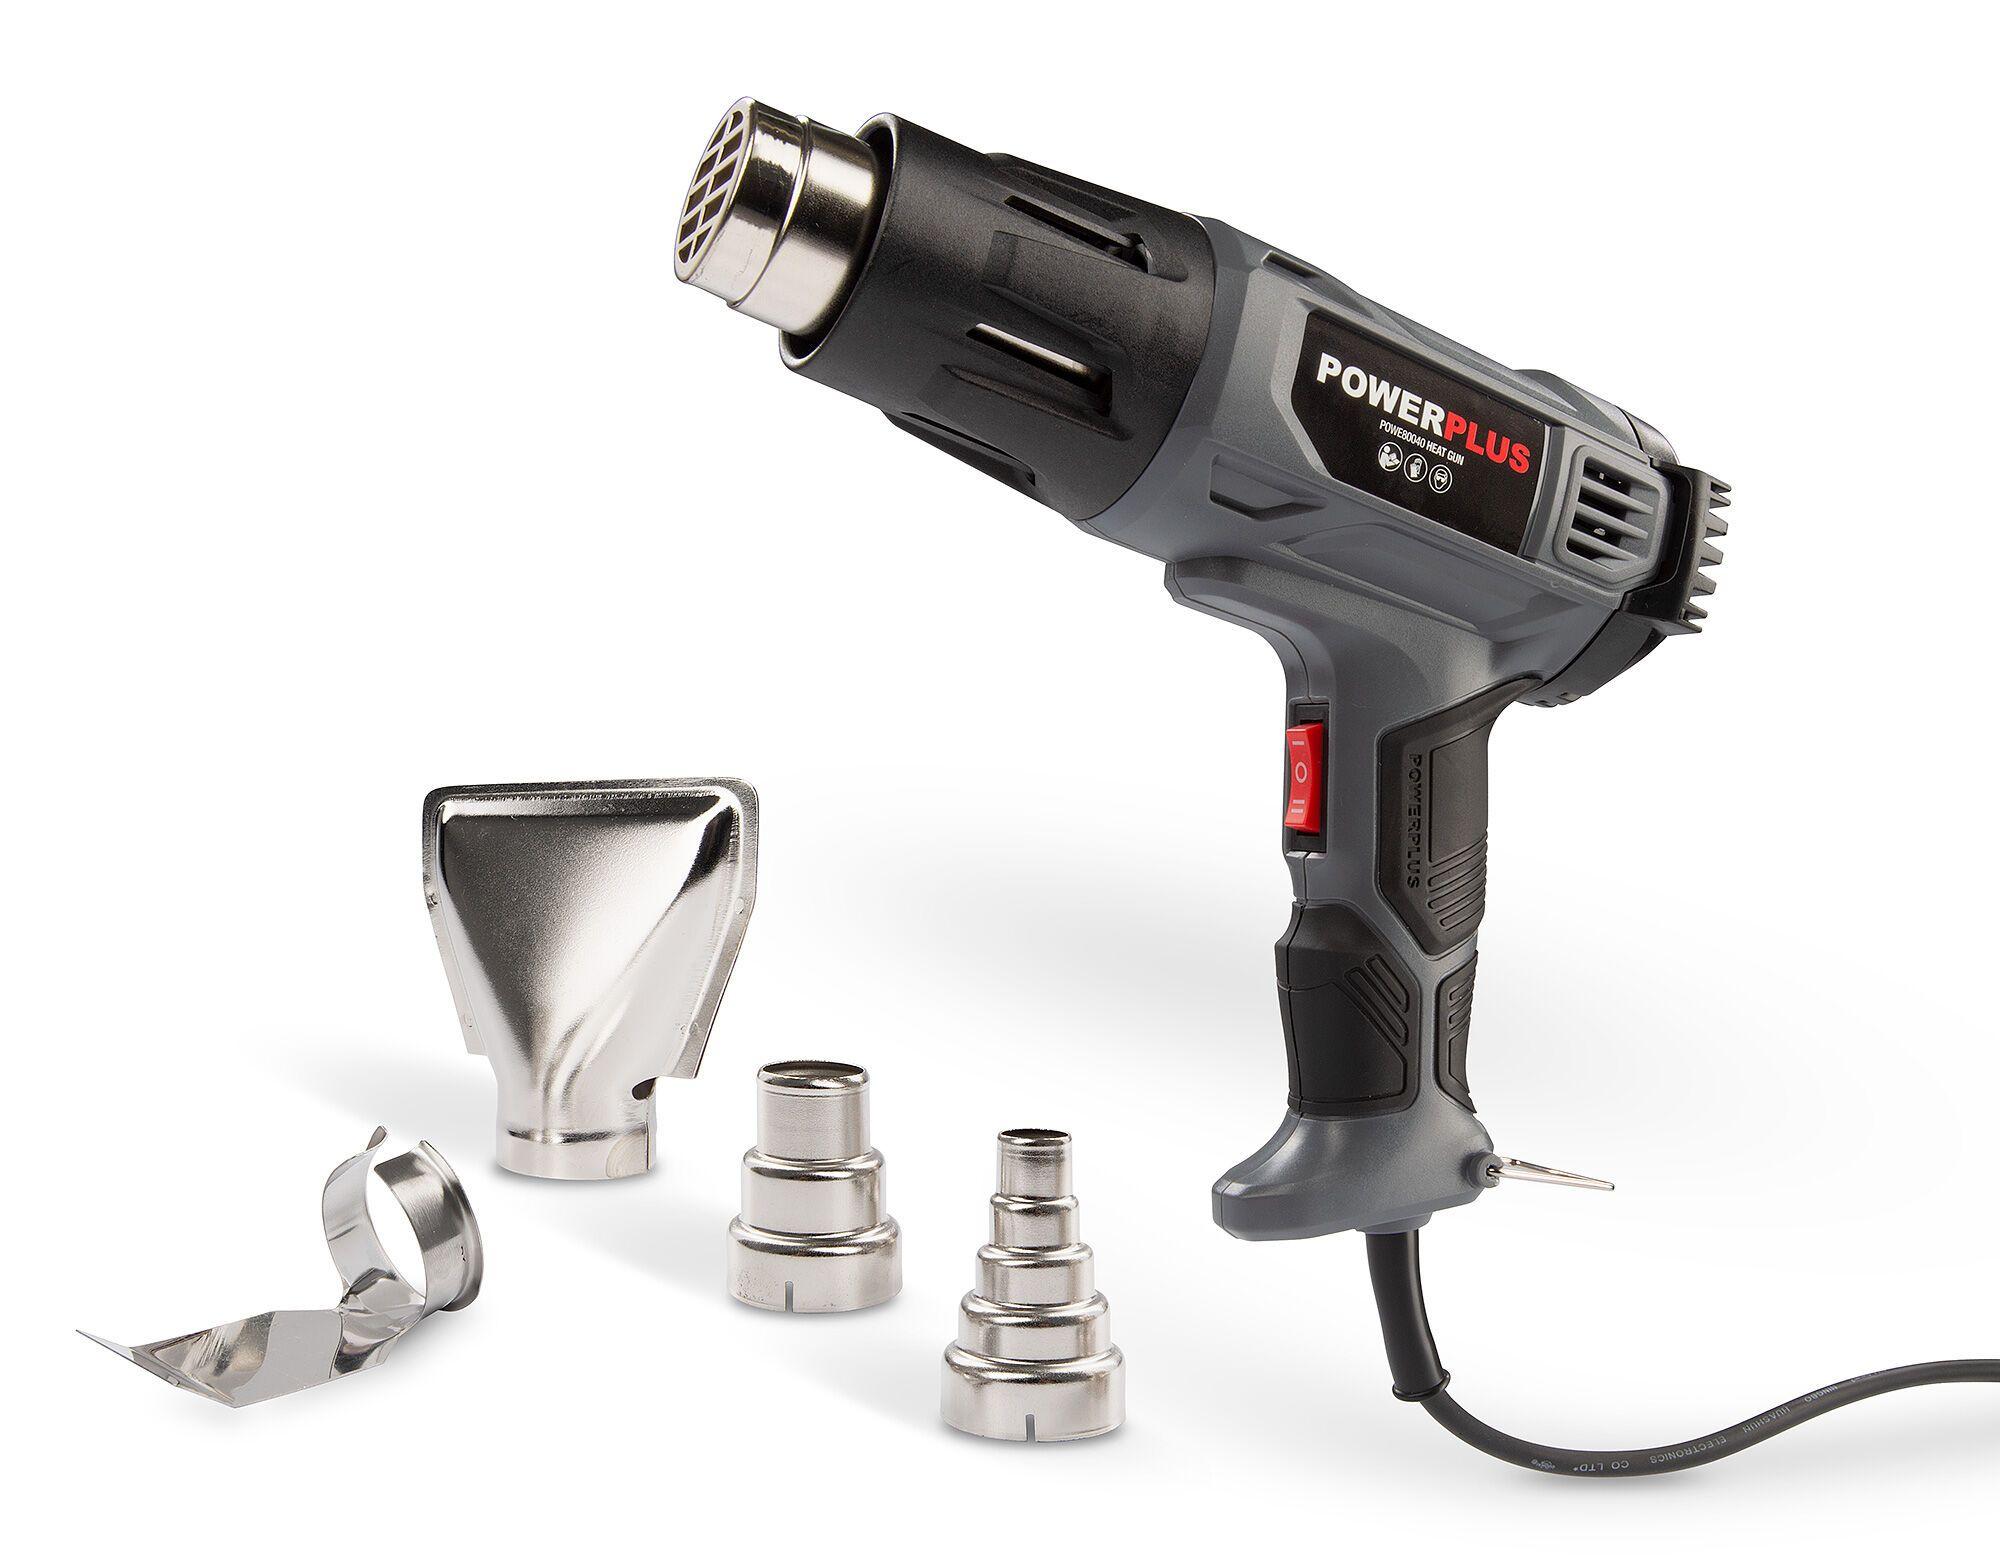 Powerplus POWE80040 Verfstripper 600W | Heteluchtpistool